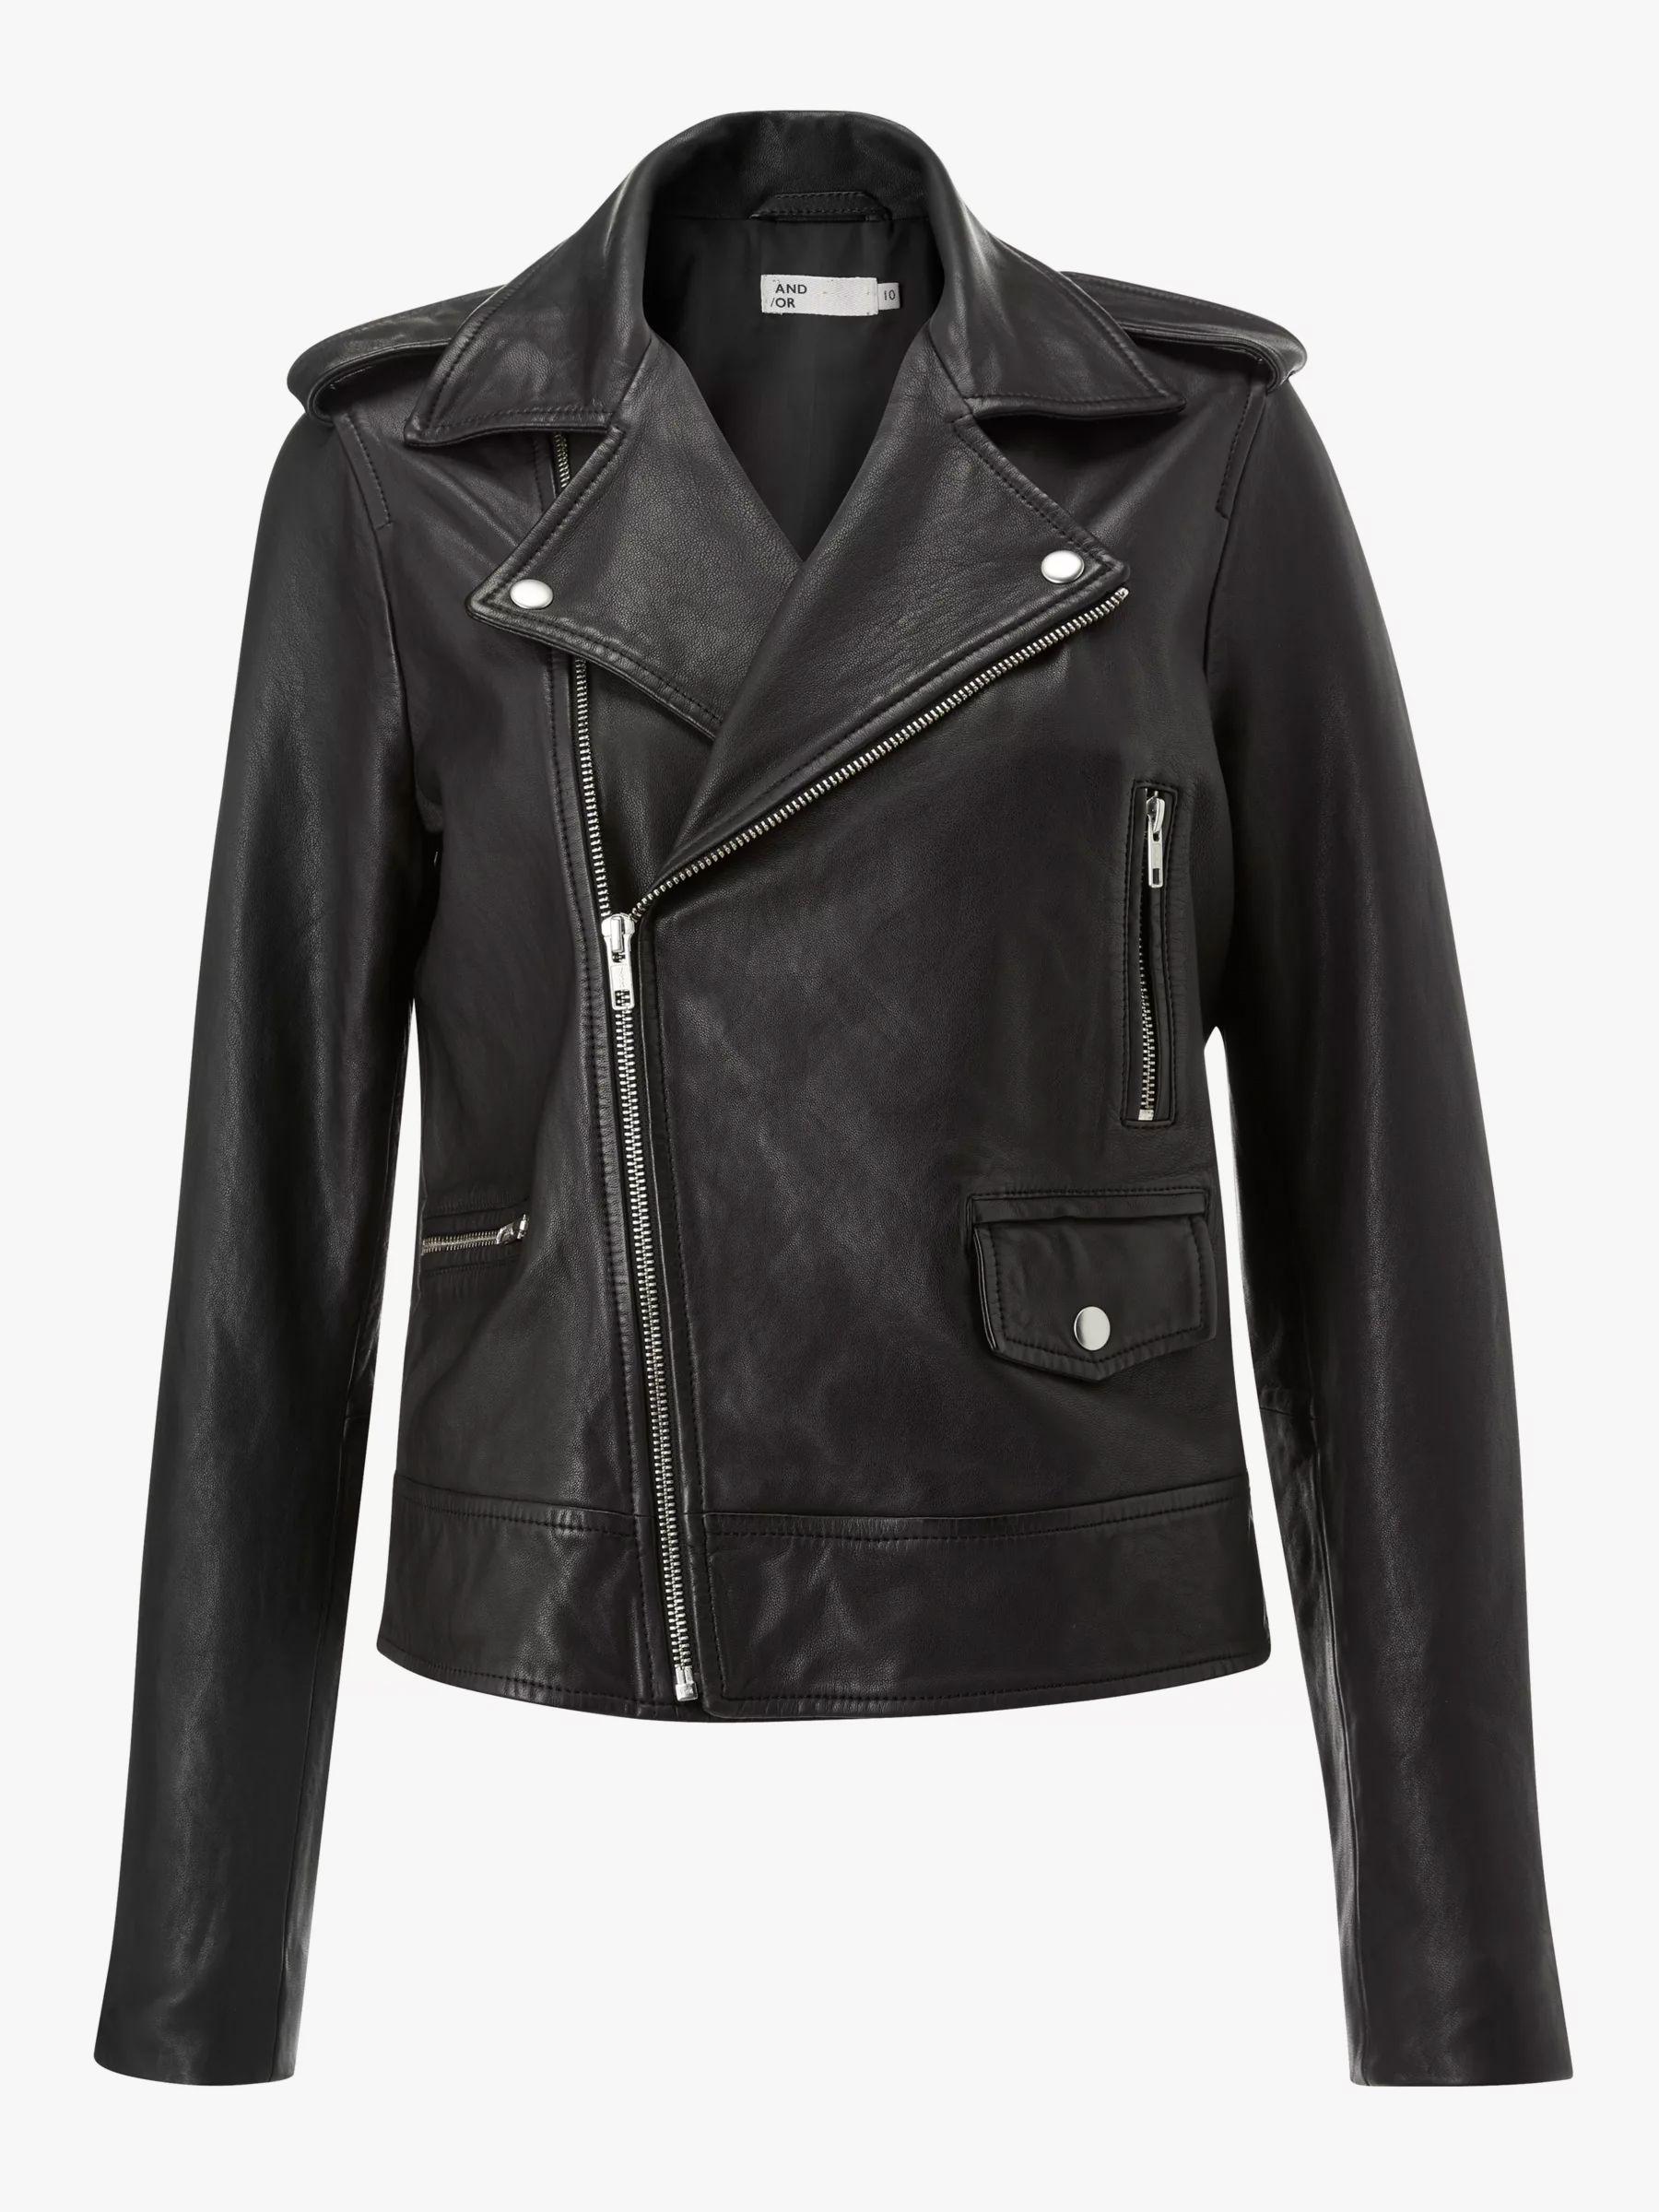 AND/OR Leather Biker Jacket, Black